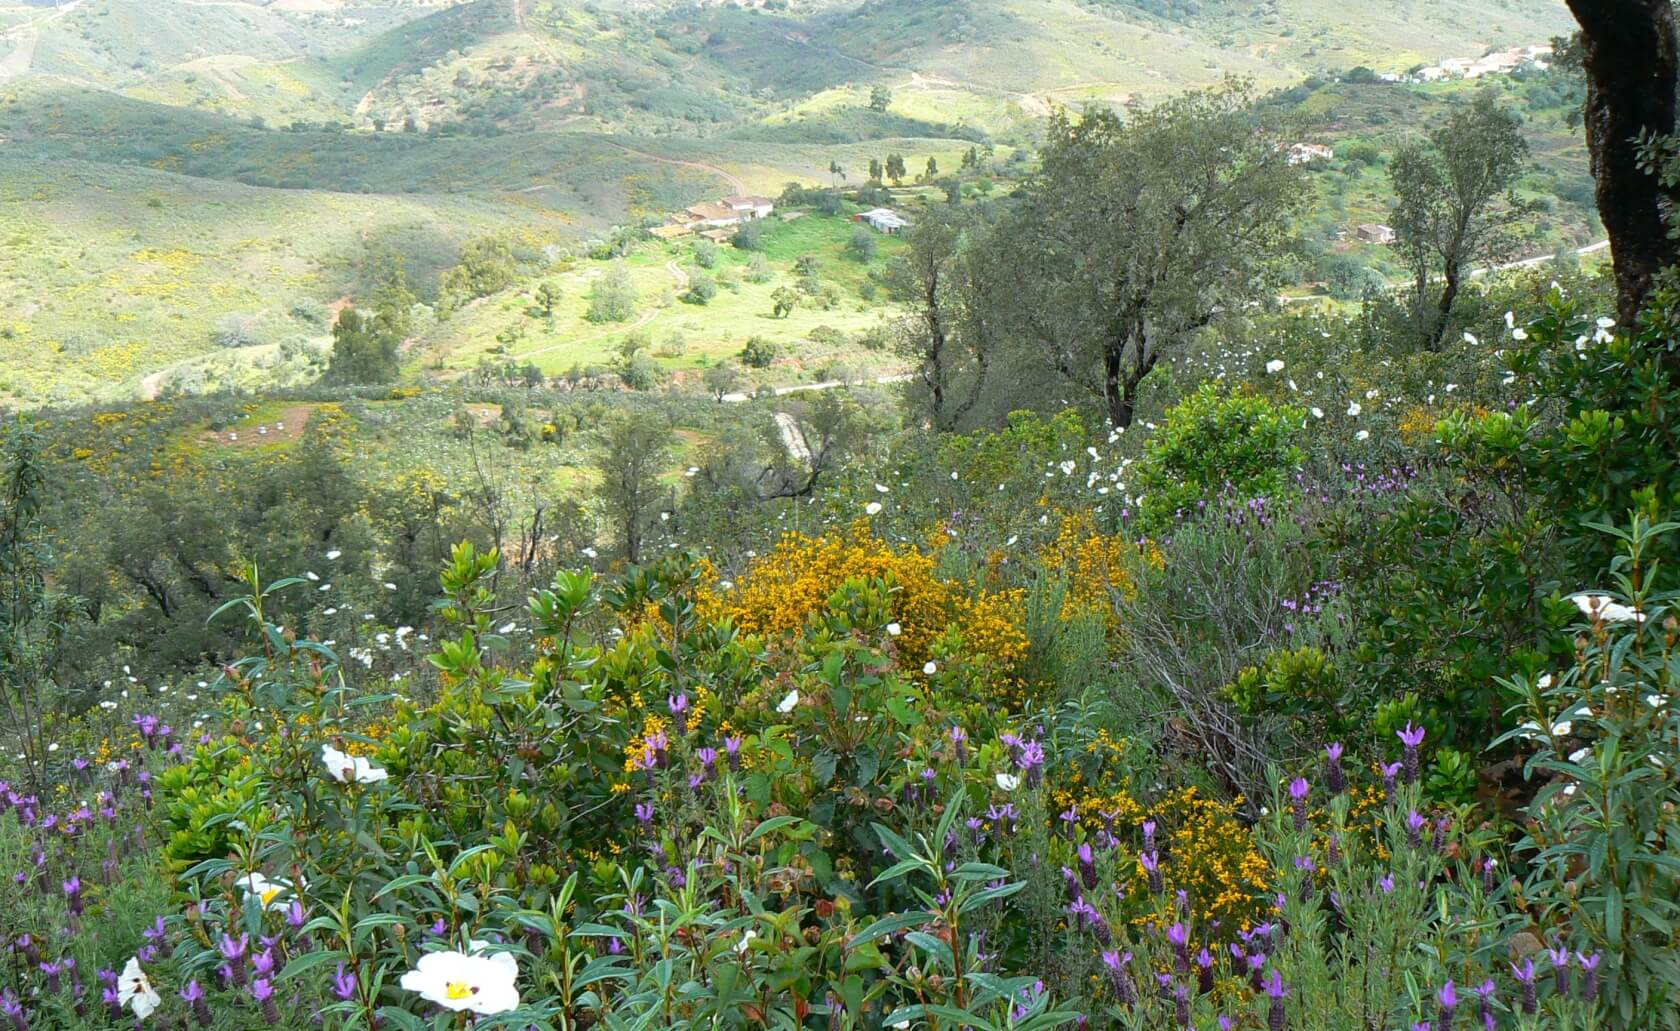 Blick über Frühlingsblüten ins Vale Fuzeiros